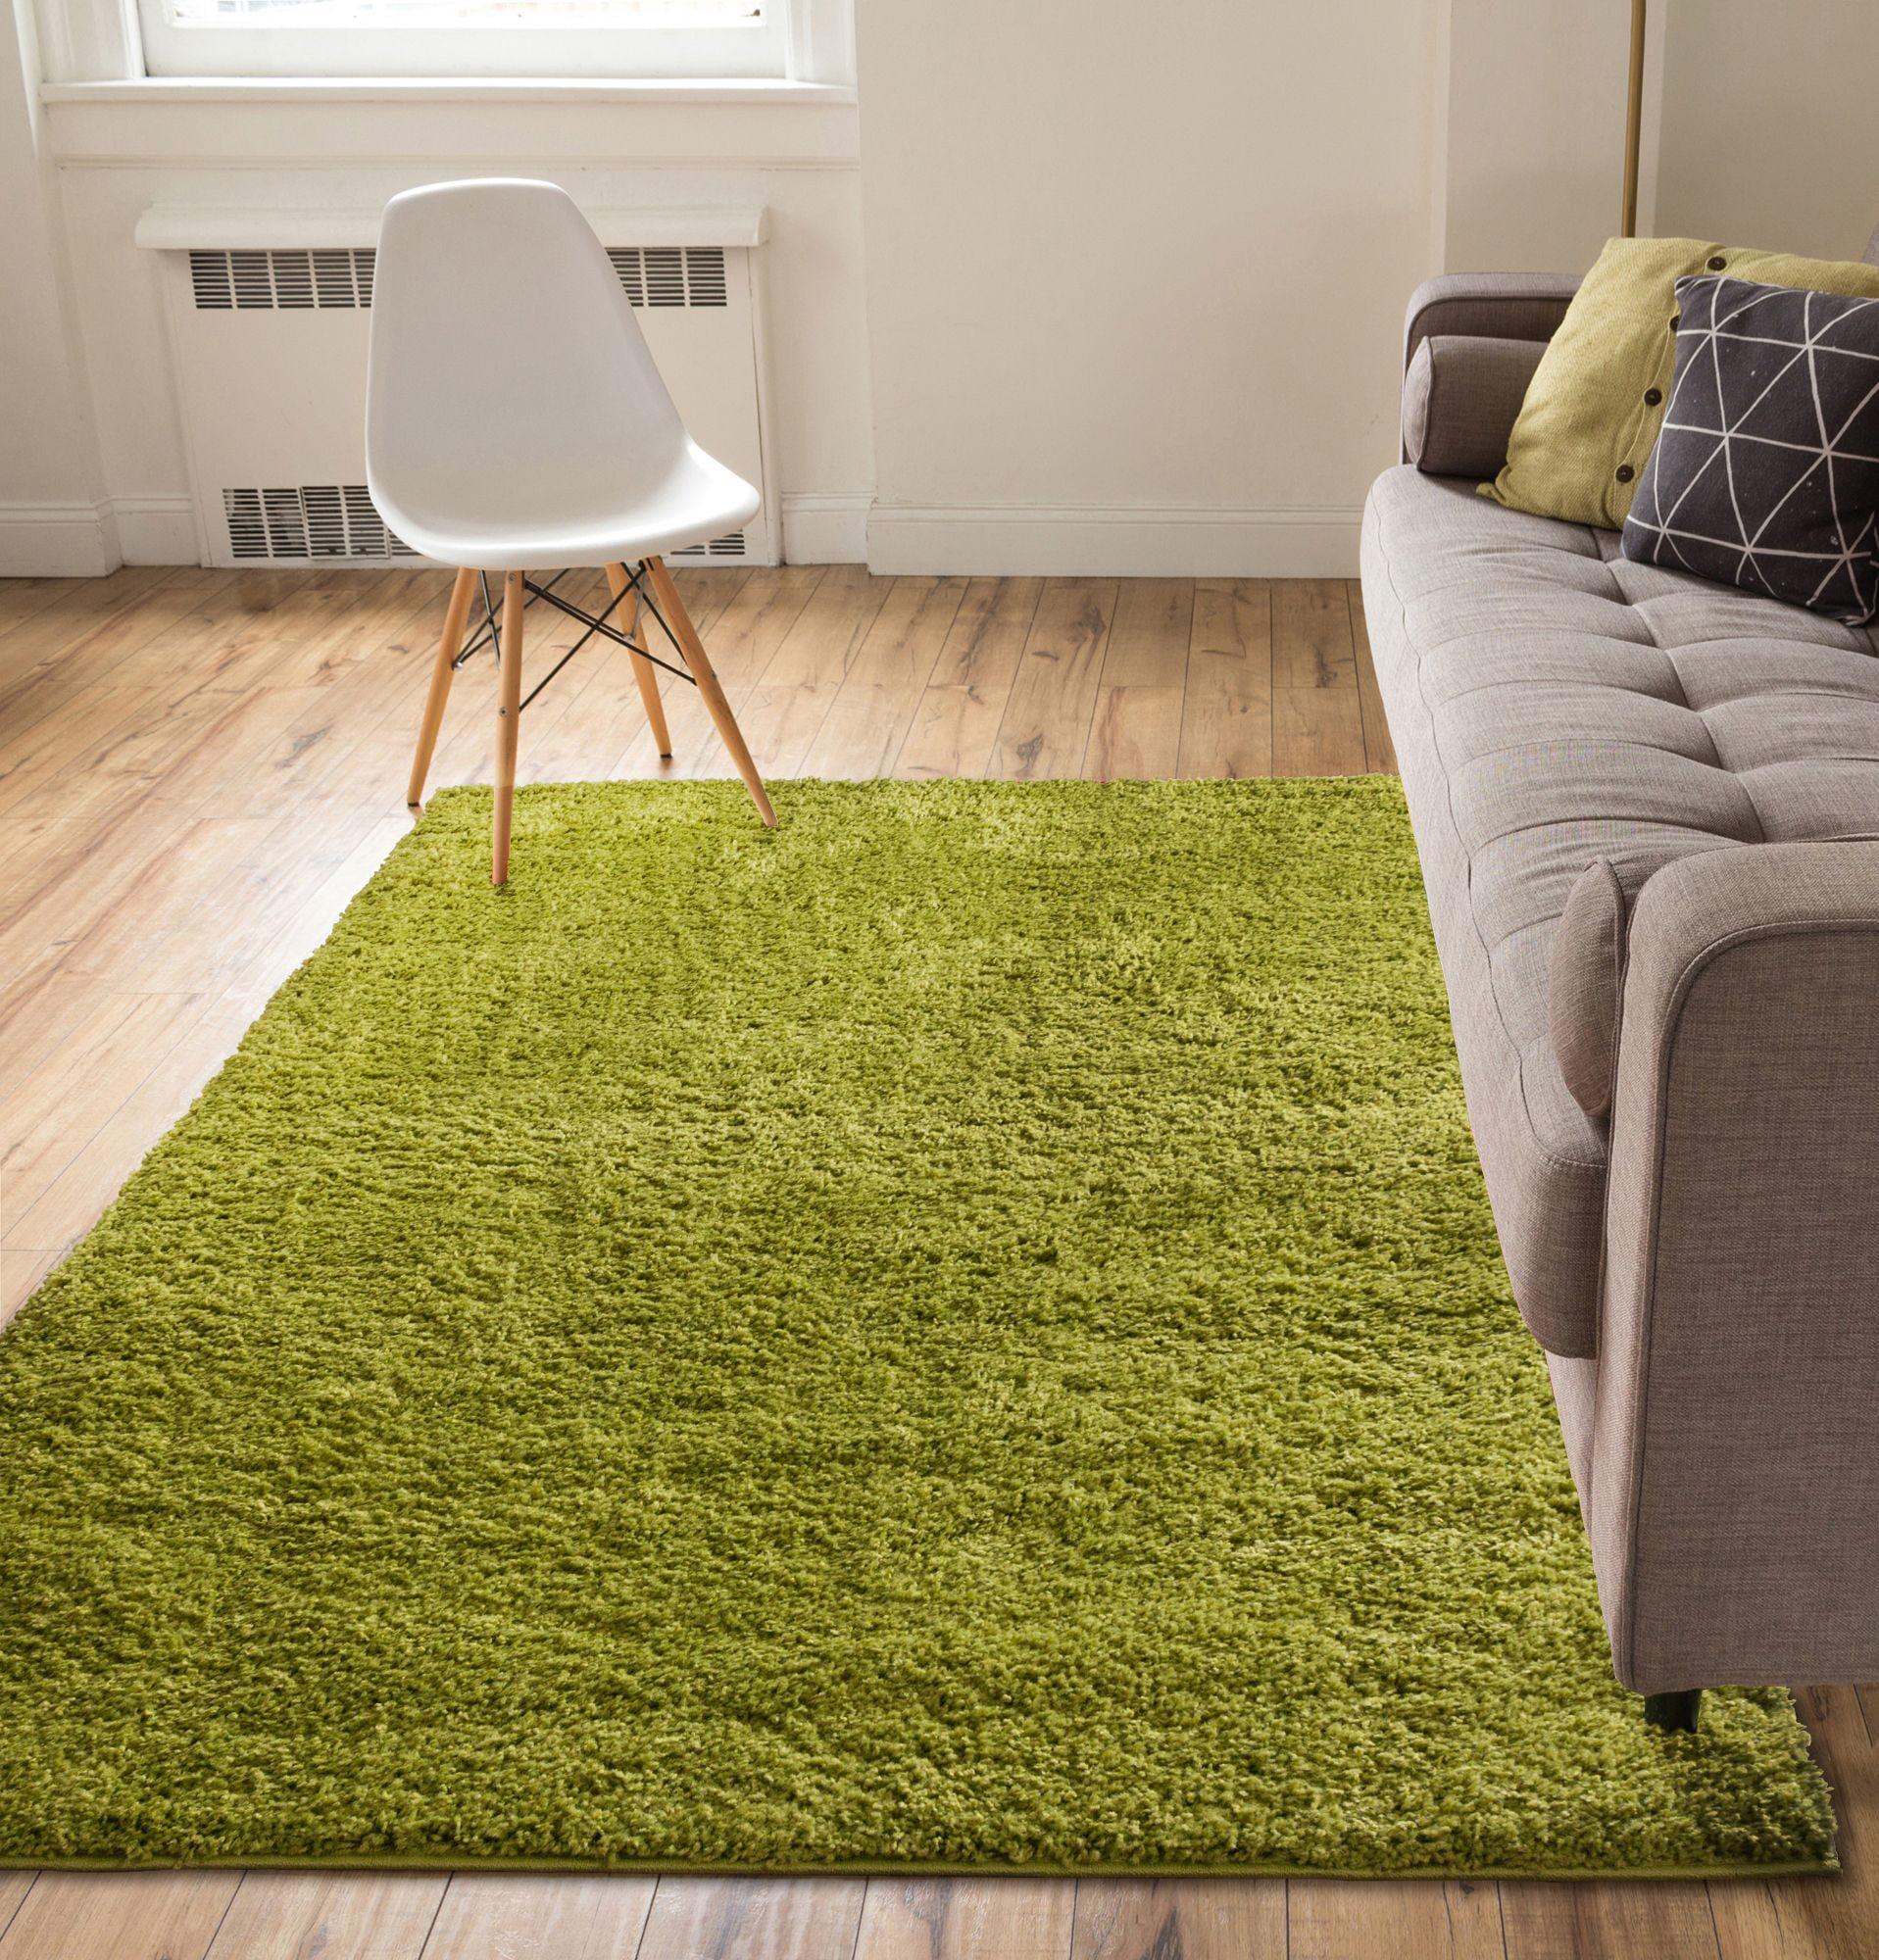 Solid Retro Modern Green Shag 3x5 ( 3'3'' x 5'3'' ) Area Rug Plain Plush Easy Care Thick Soft Plush Living Room Kids Bedroom